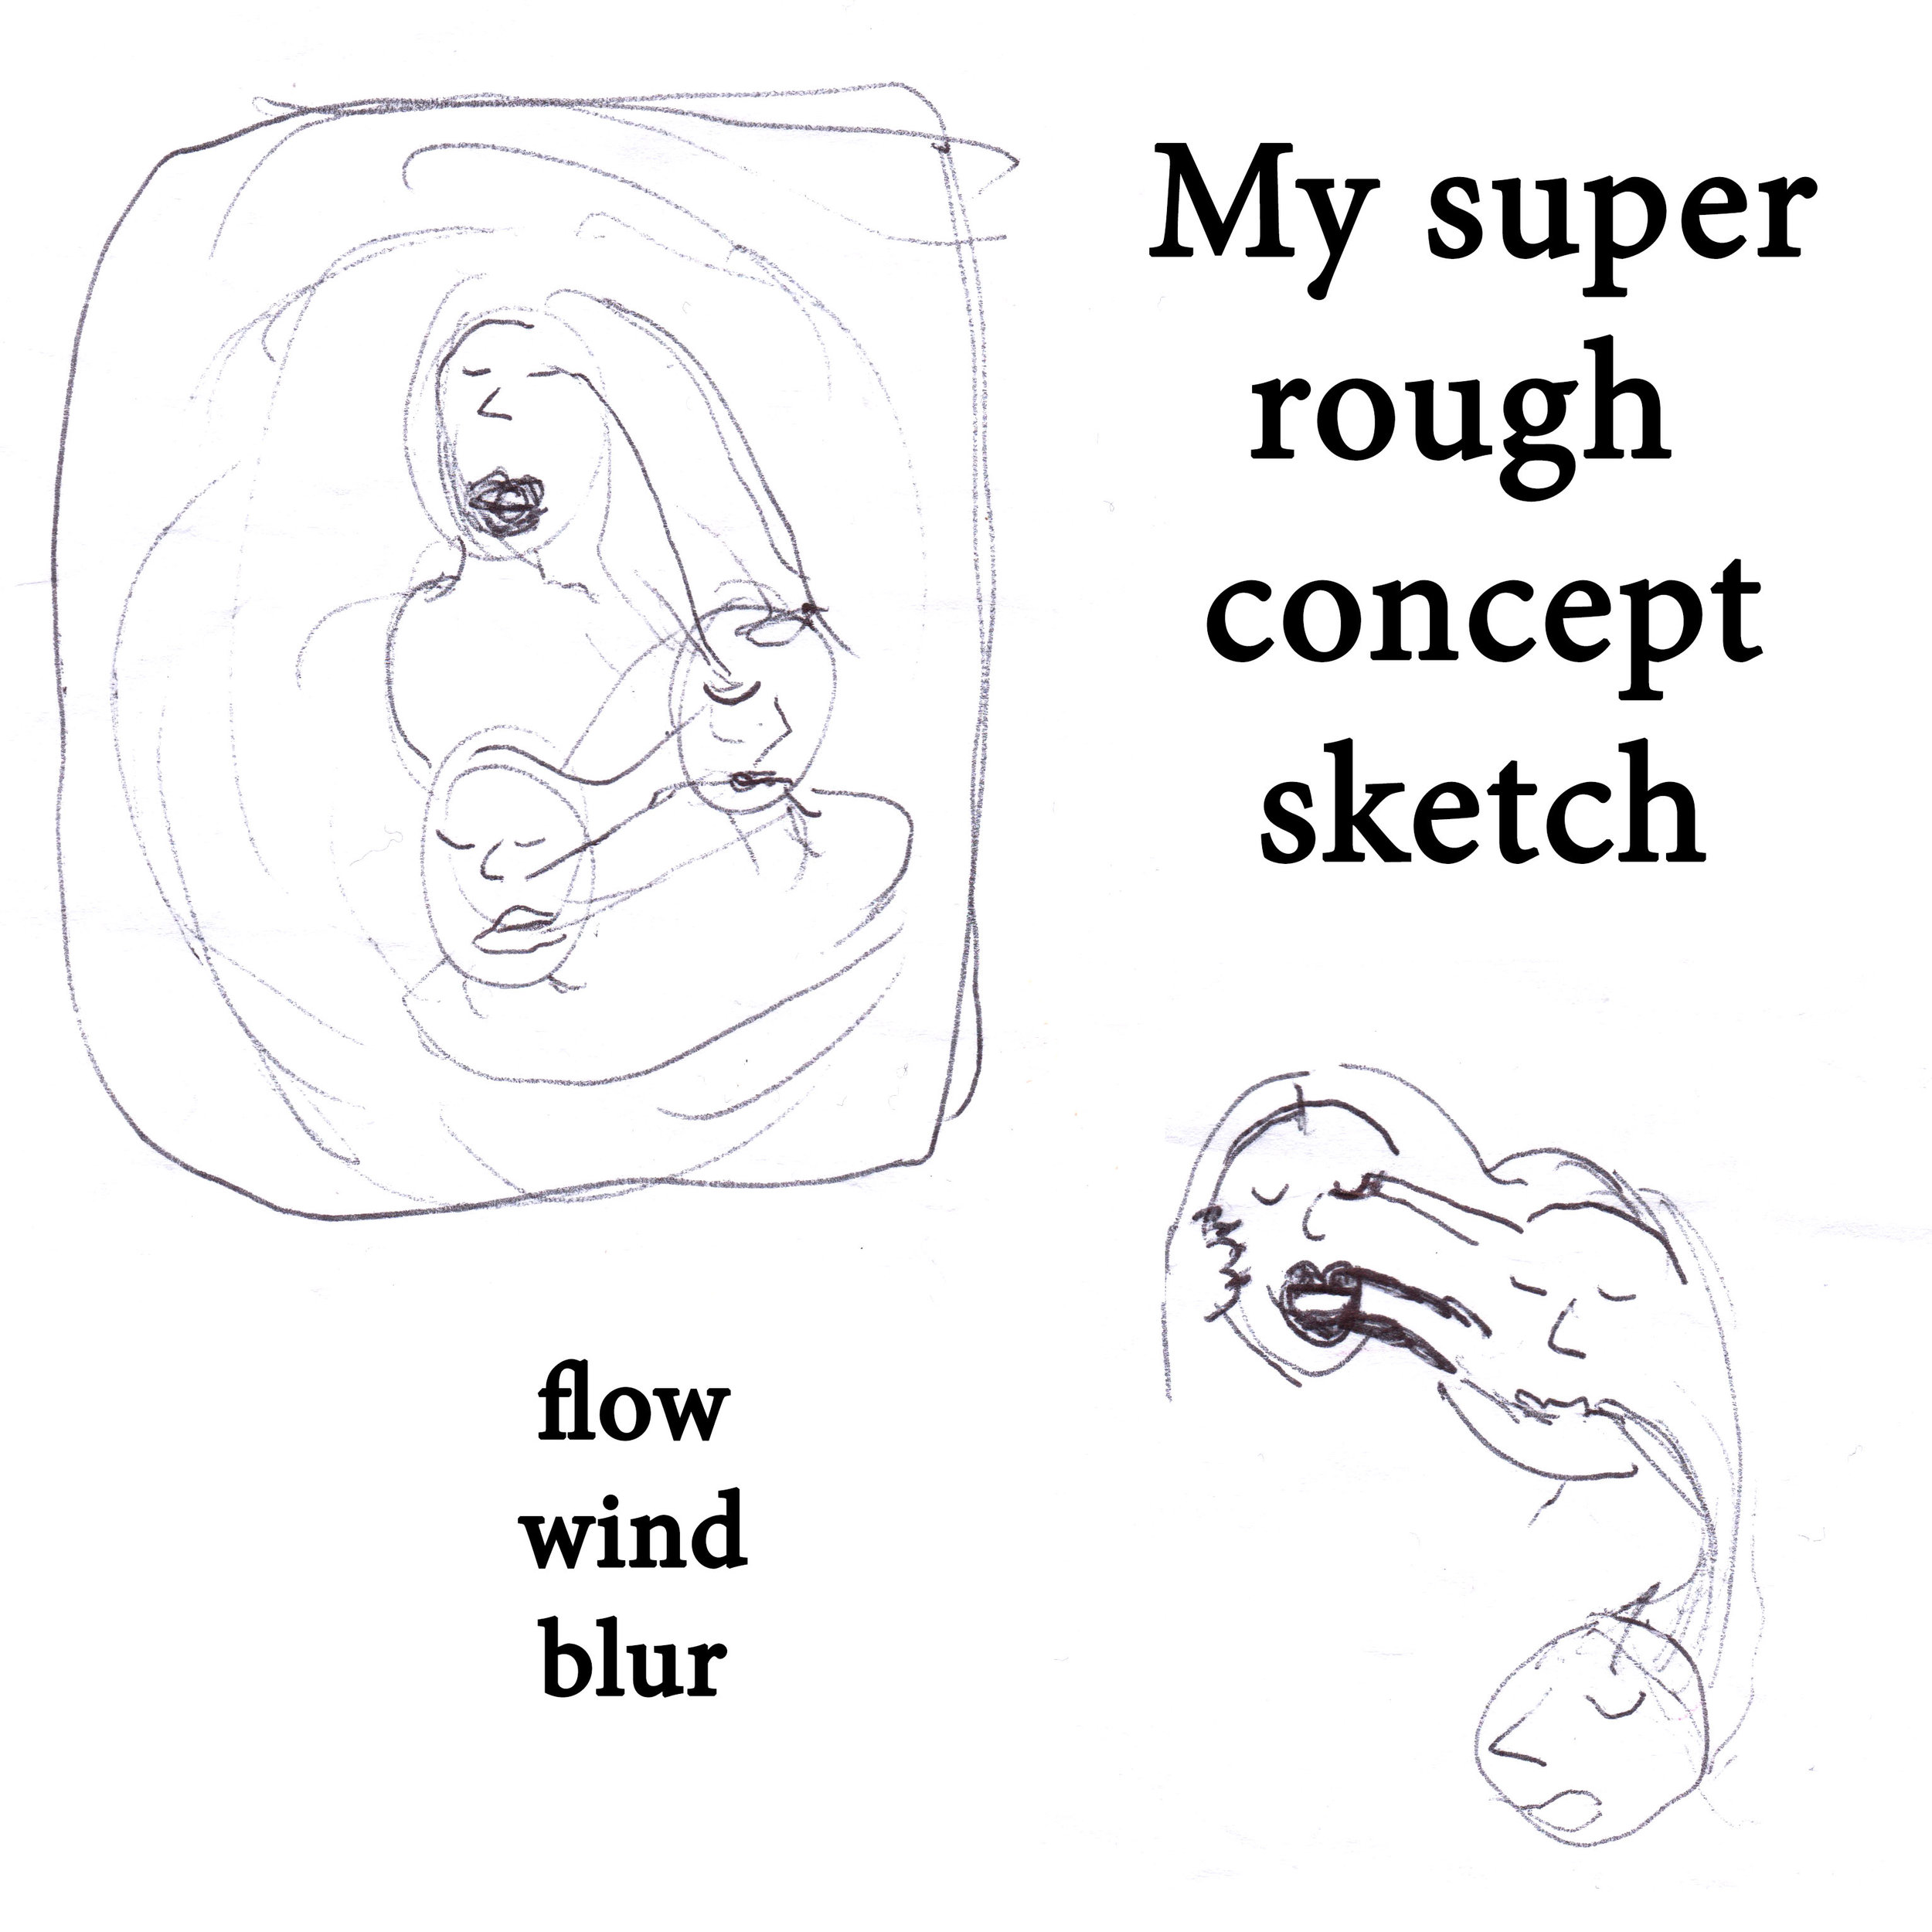 mockup concept sketch for photography.jpg